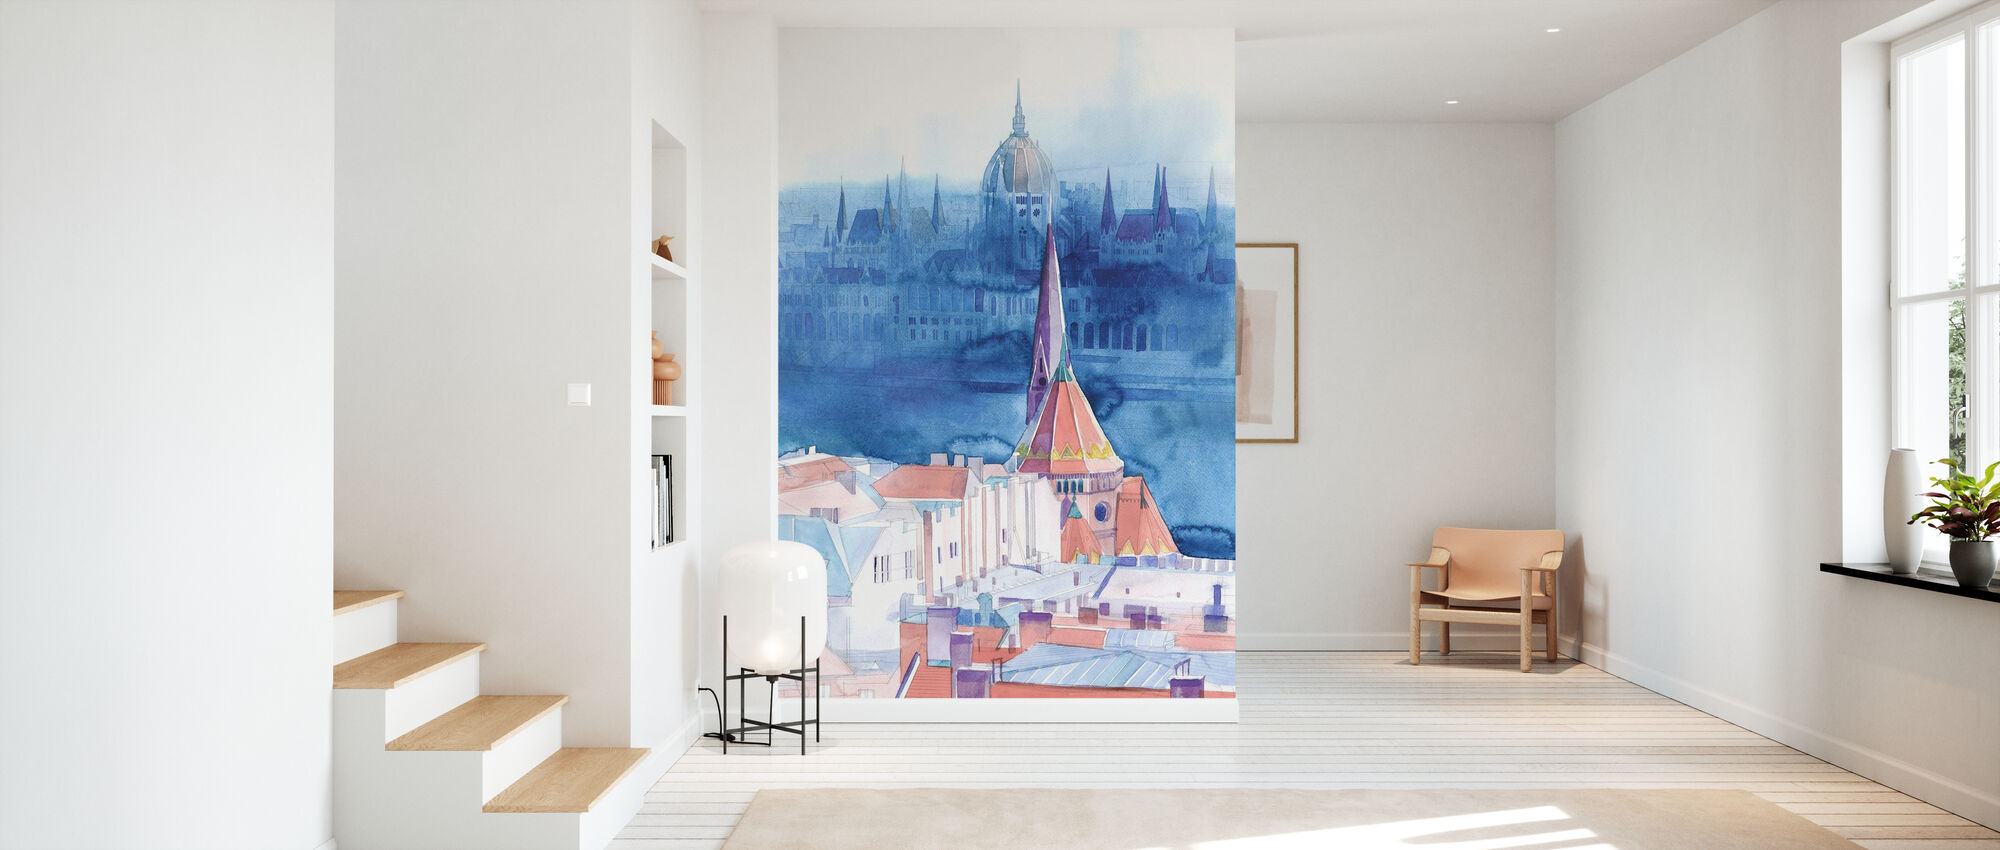 Morning in Budapest - Wallpaper - Hallway